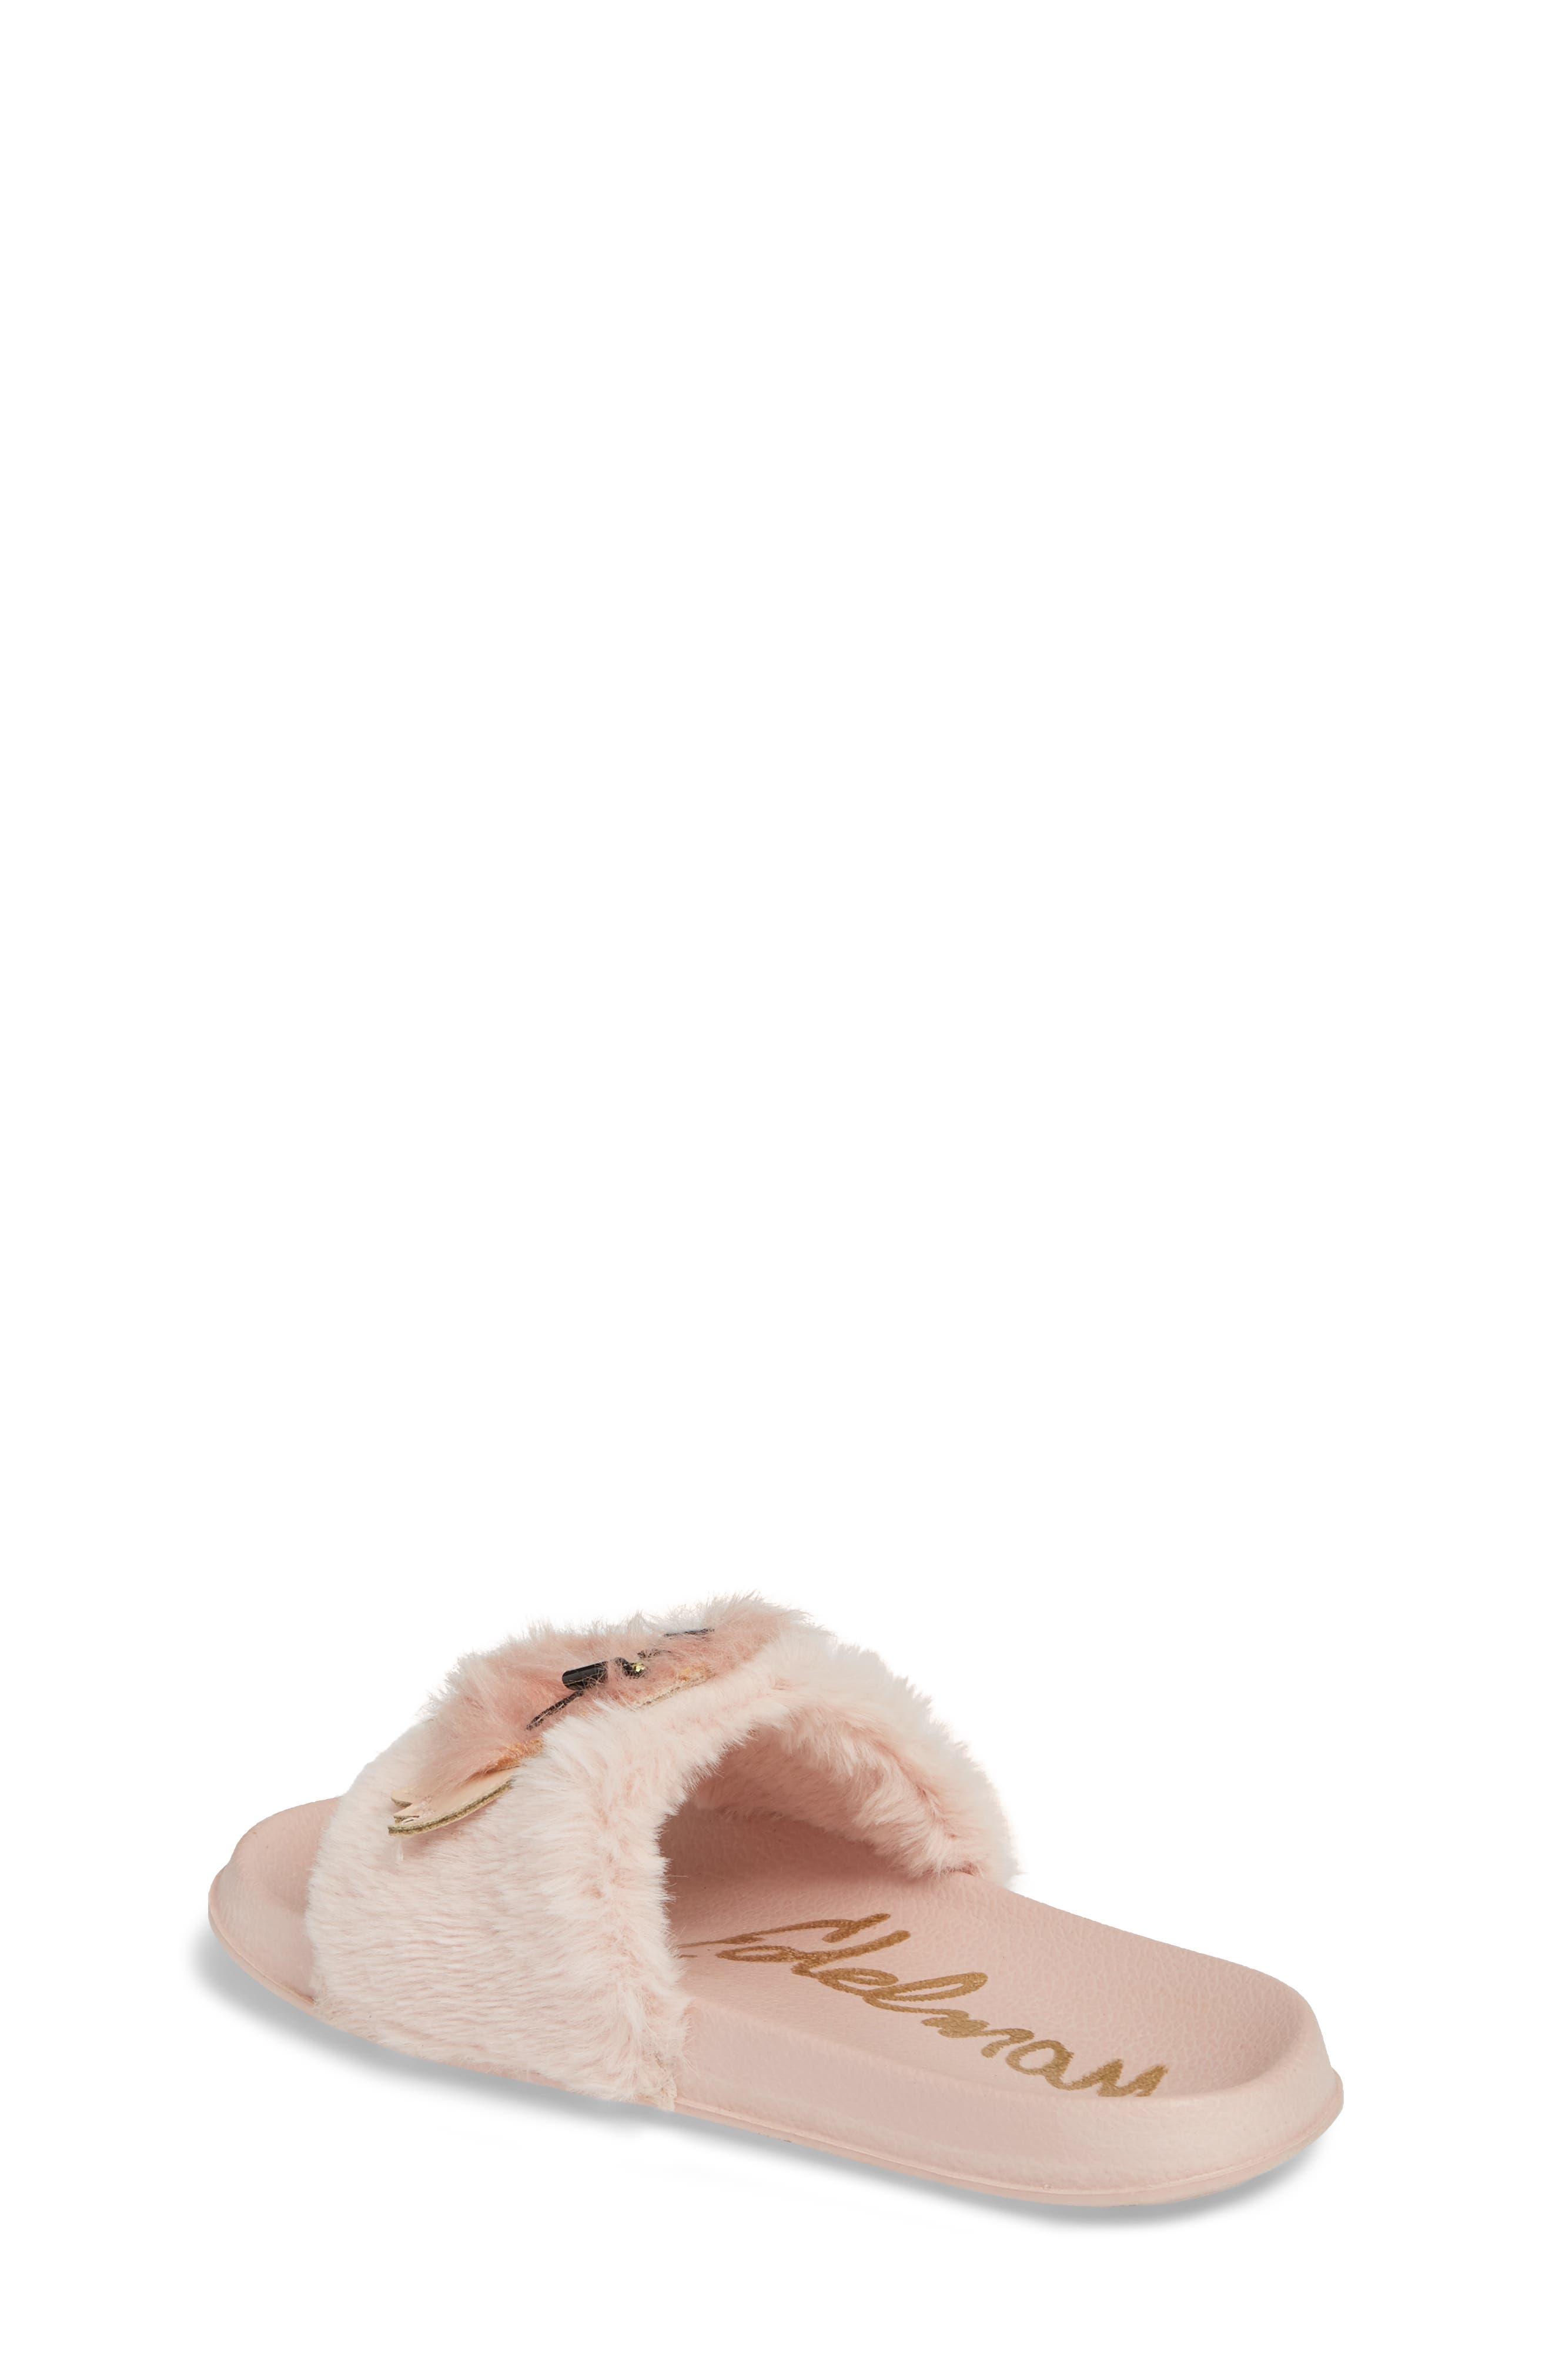 Mackie Furry Faux Fur Slide Sandal,                             Alternate thumbnail 2, color,                             654